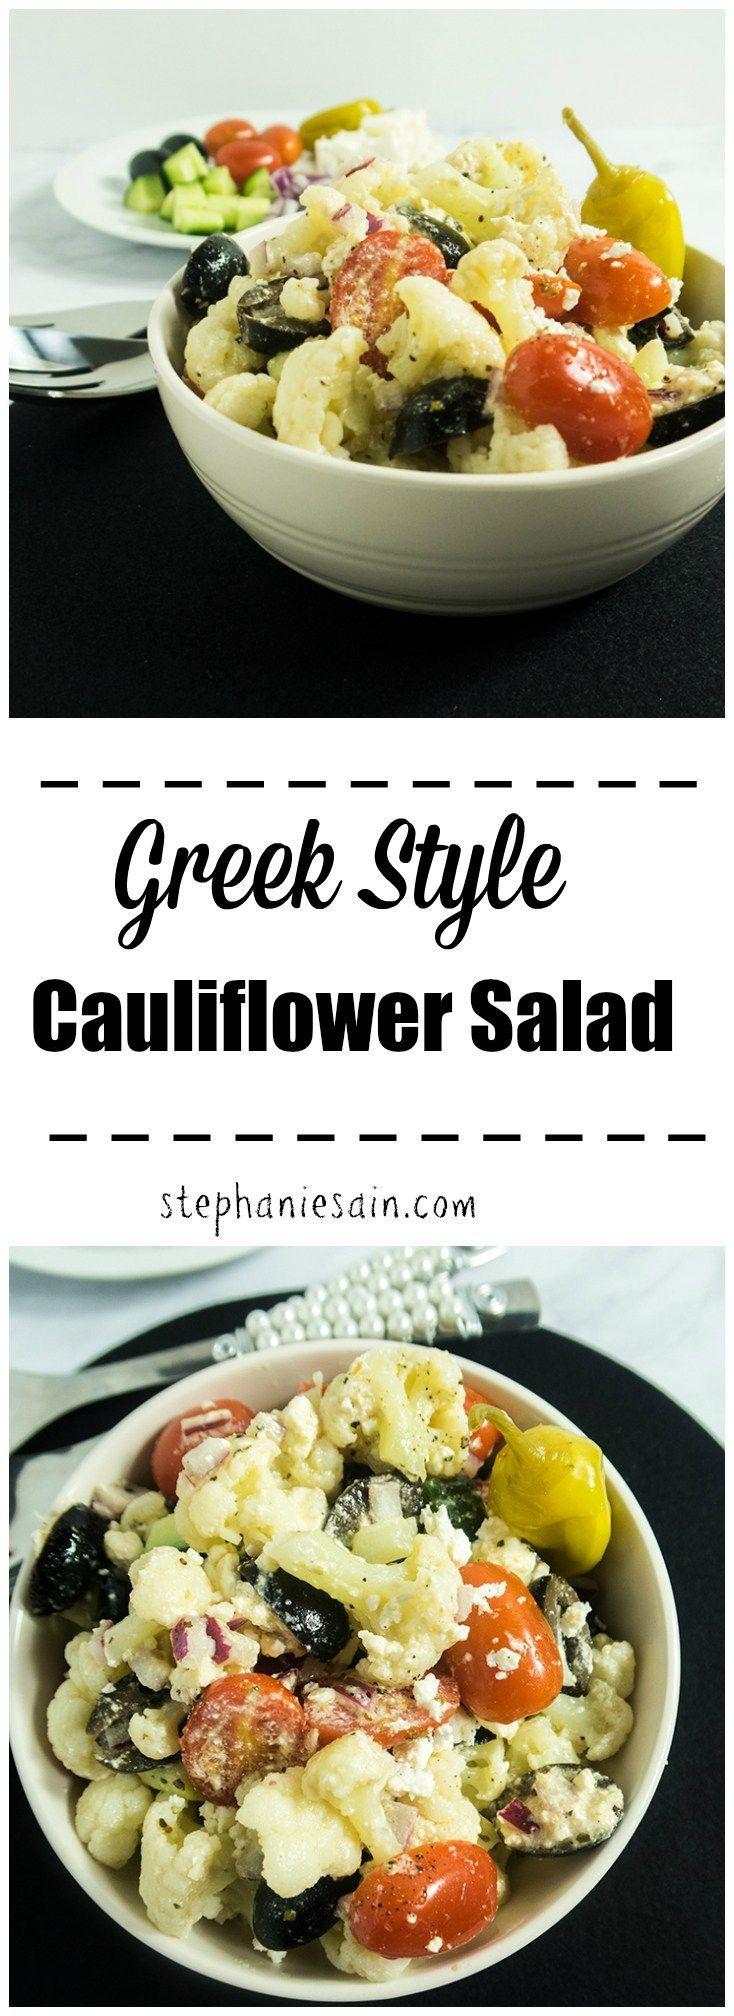 This Greek Style Cauliflower Salad is a tasty, light make ahead salad loaded with cauliflower and a greek dressing. Vegetarian & Gluten Free.